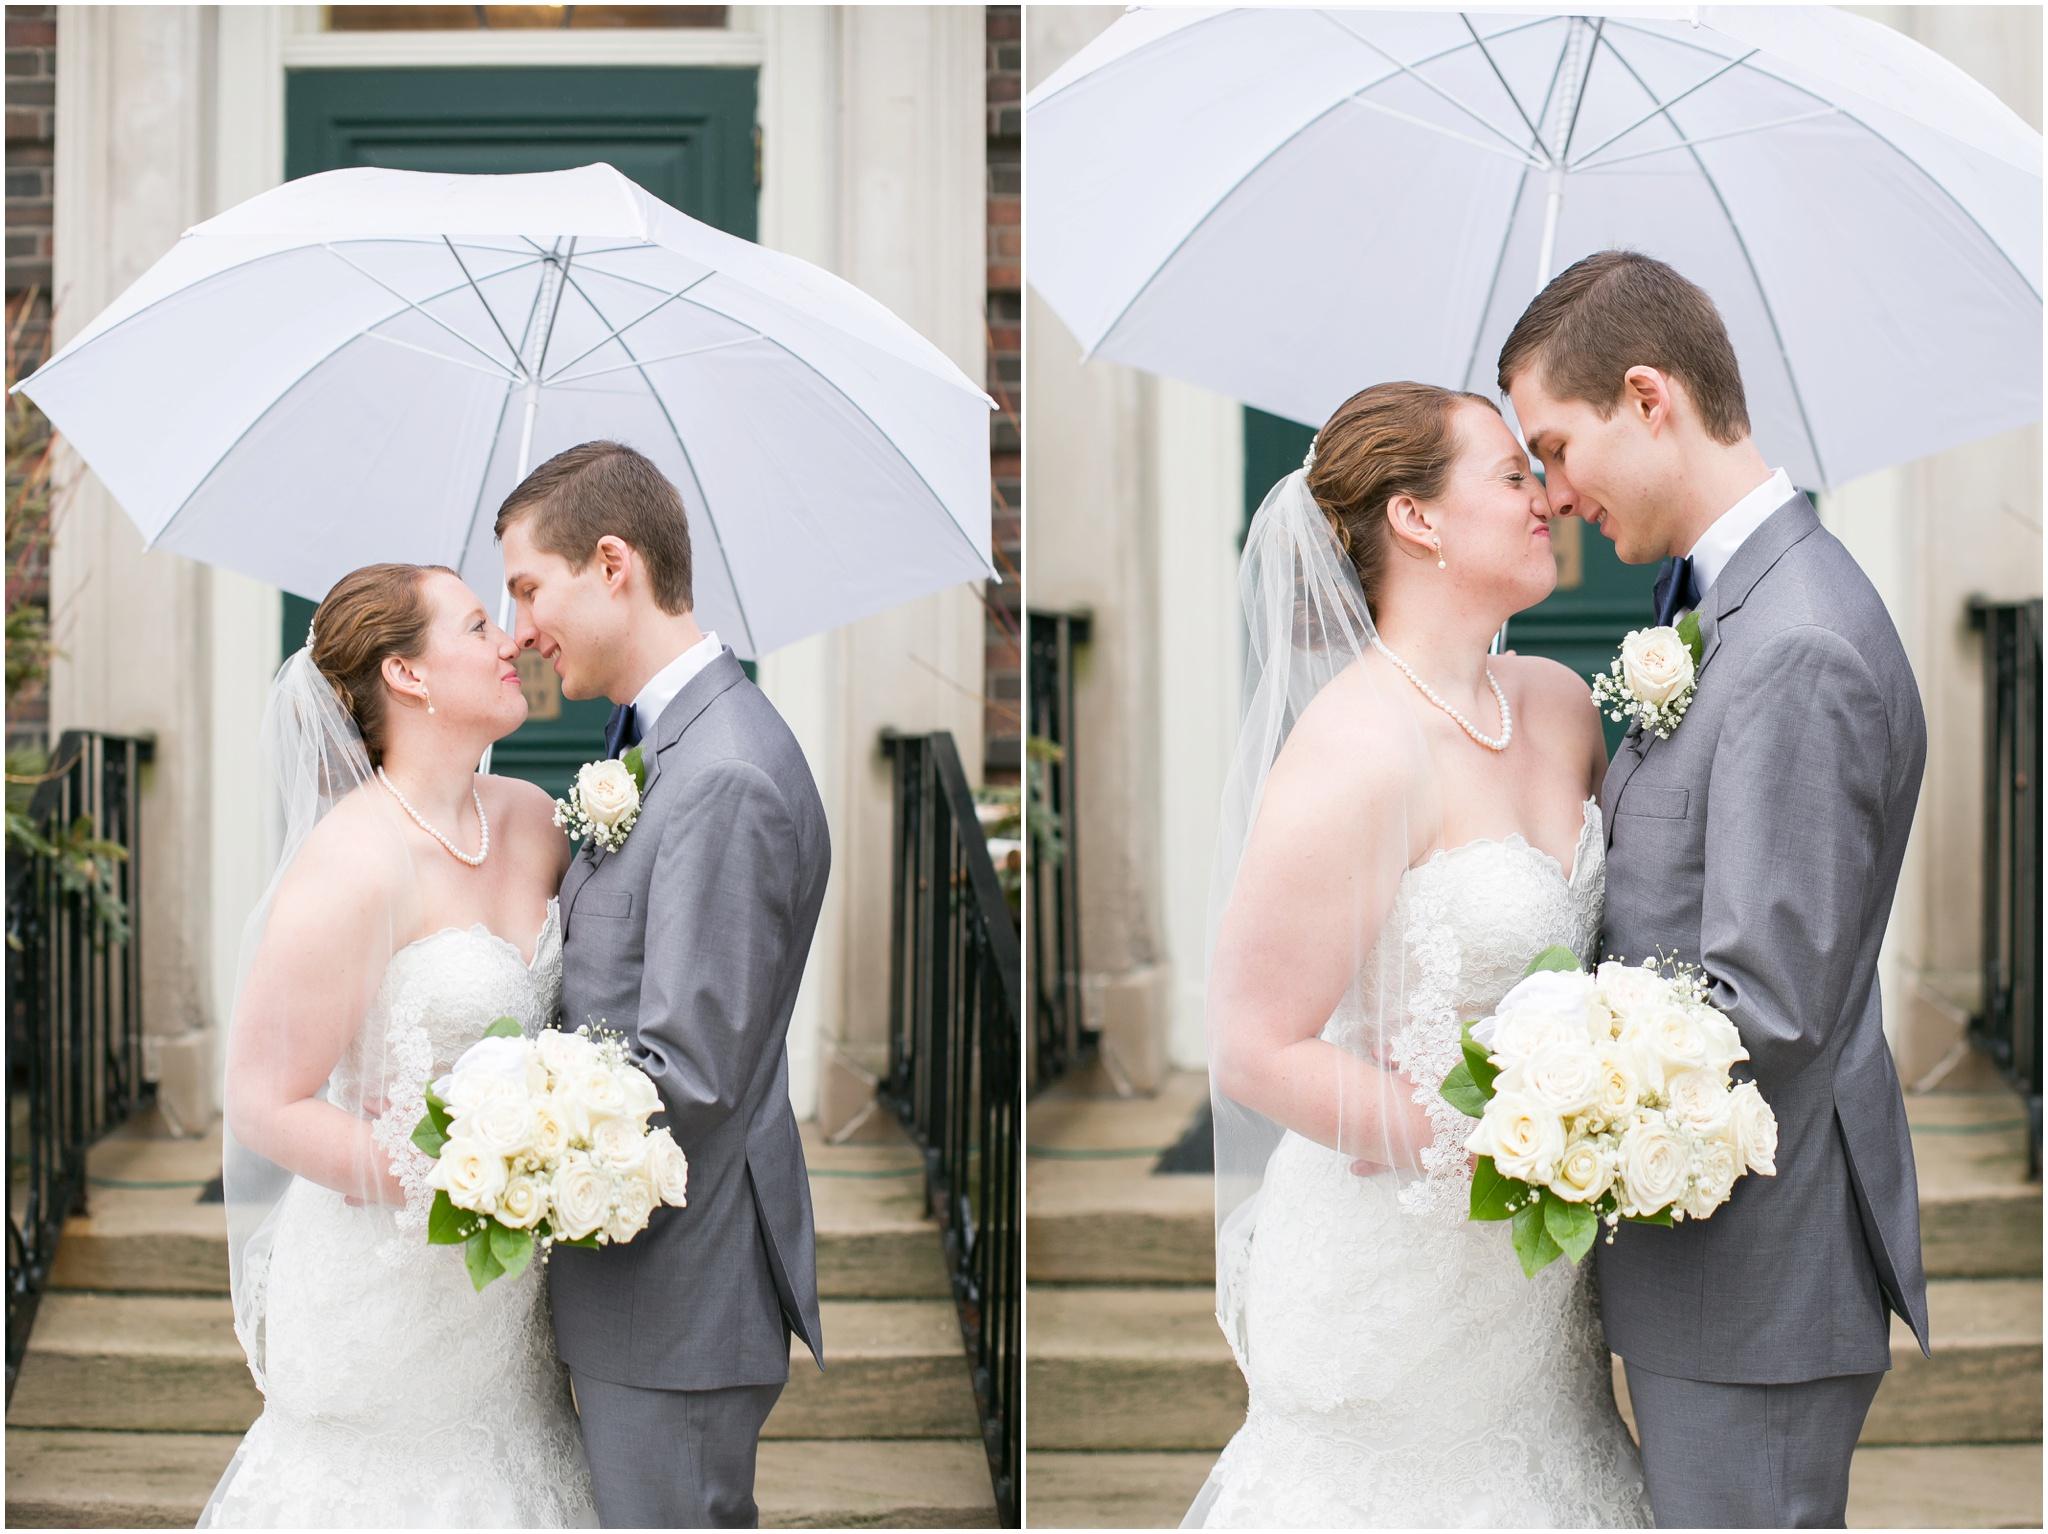 Madison_Club_Madison_Wisconsin_Wedding_Photographer_Spring_Rainy_Wedding_2633.jpg